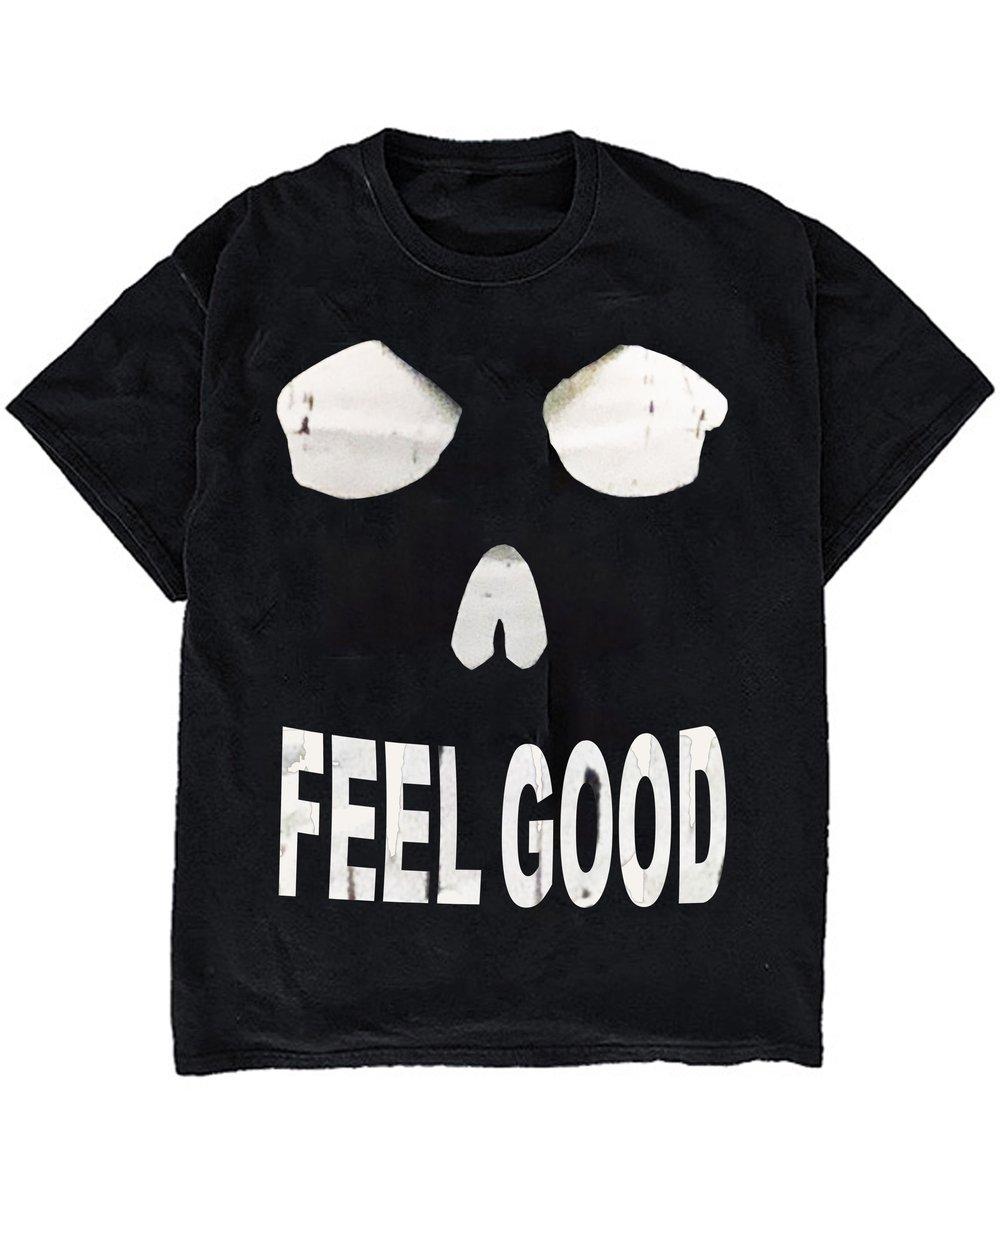 Image of FEEL GOOD TEE - BLACK